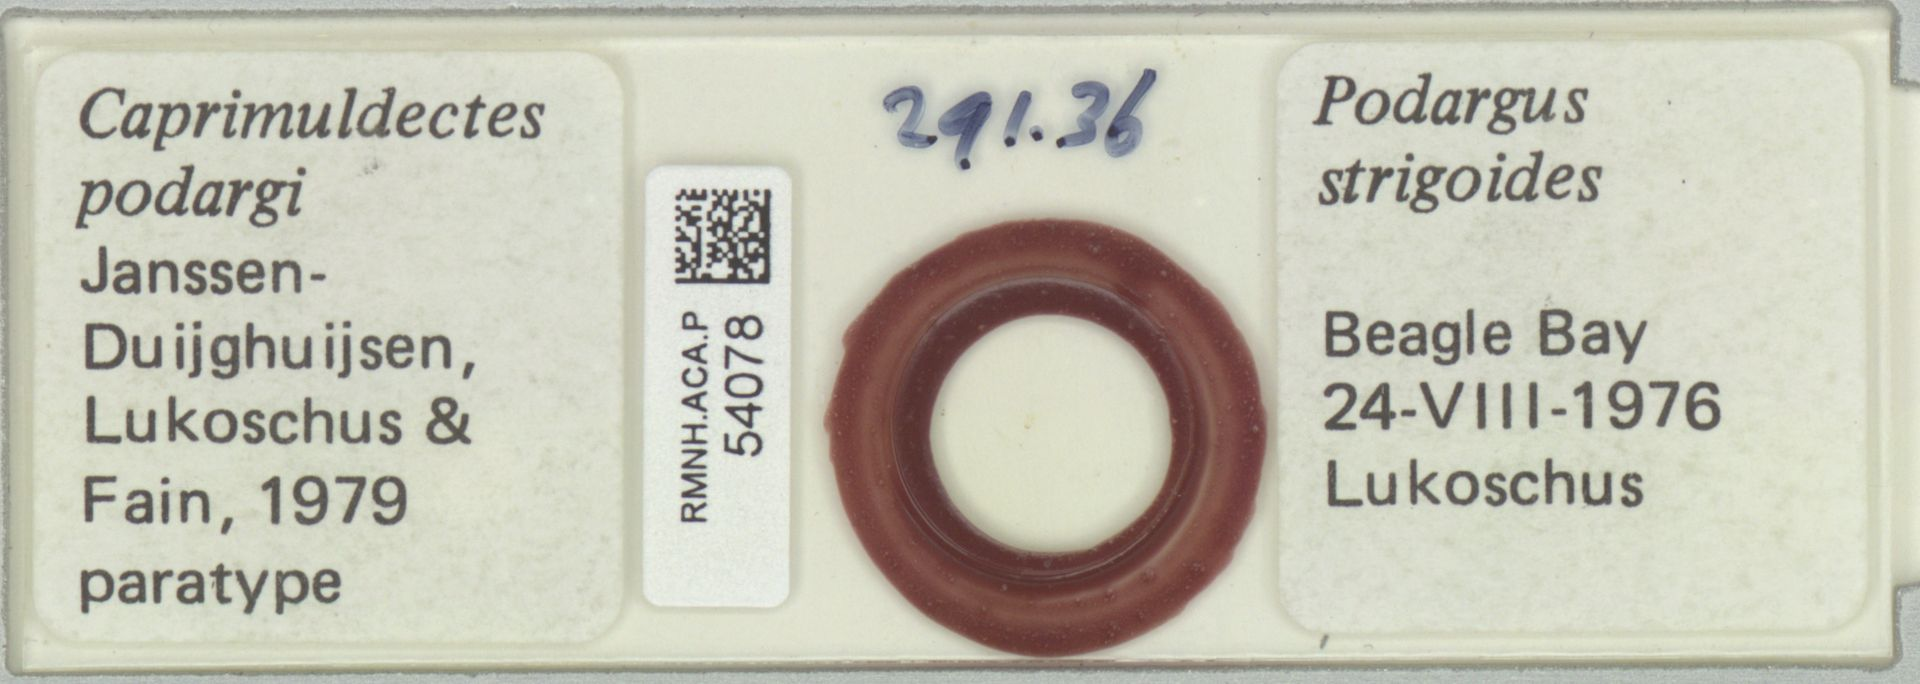 RMNH.ACA.P.54078   Caprimuldectes podargi Janssen Duijghuisen, Lukoschus & Fain, 1979